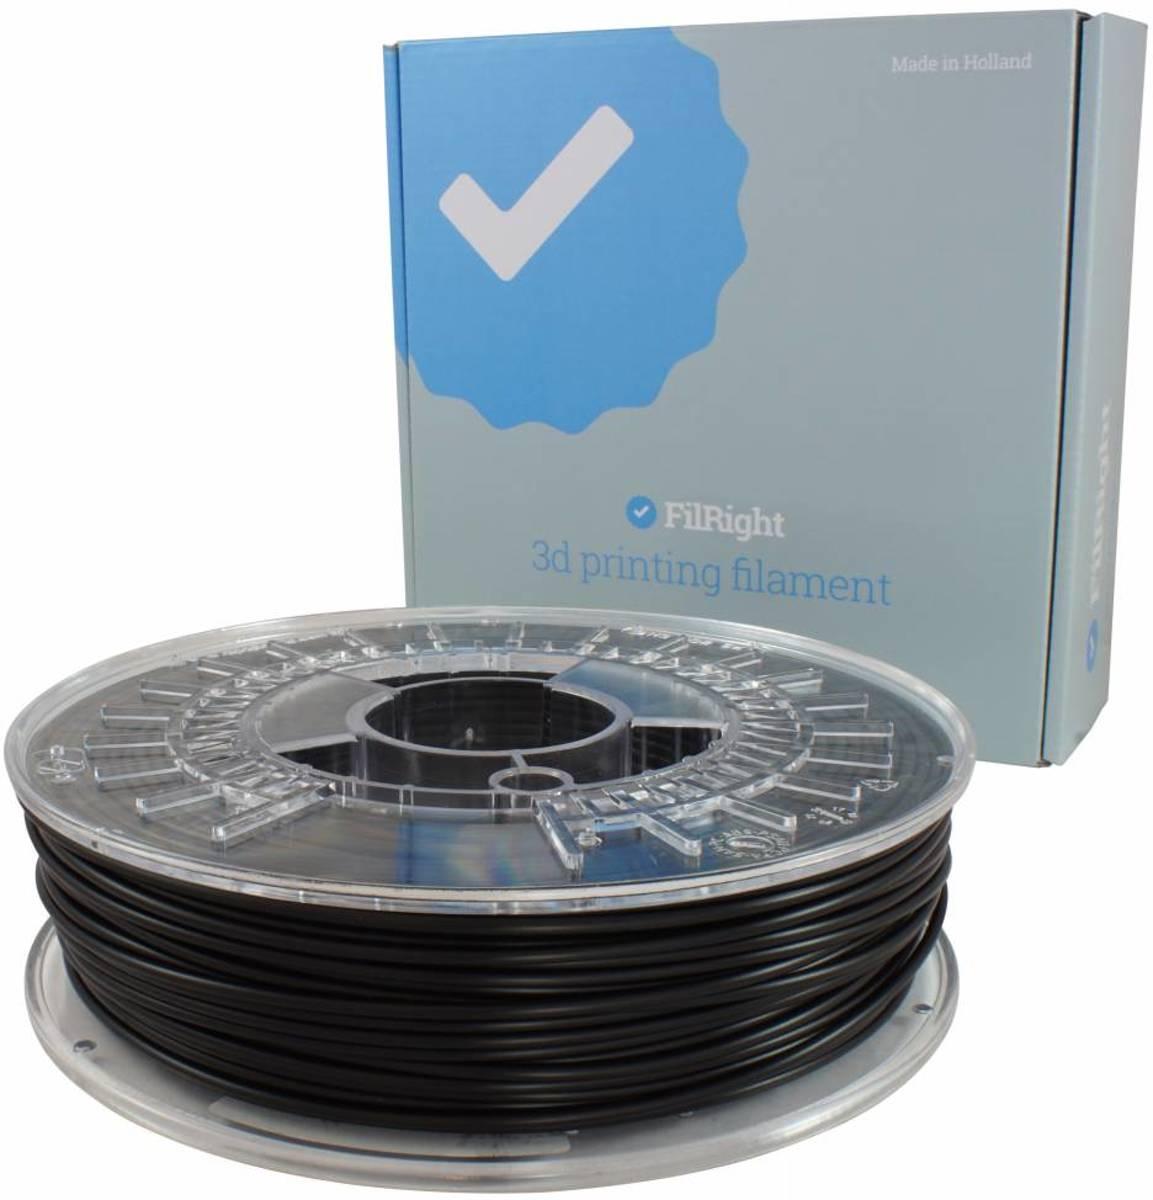 FilRight Engineering TPU Flexibel Filament - 2.85mm - 500 g - Zwart